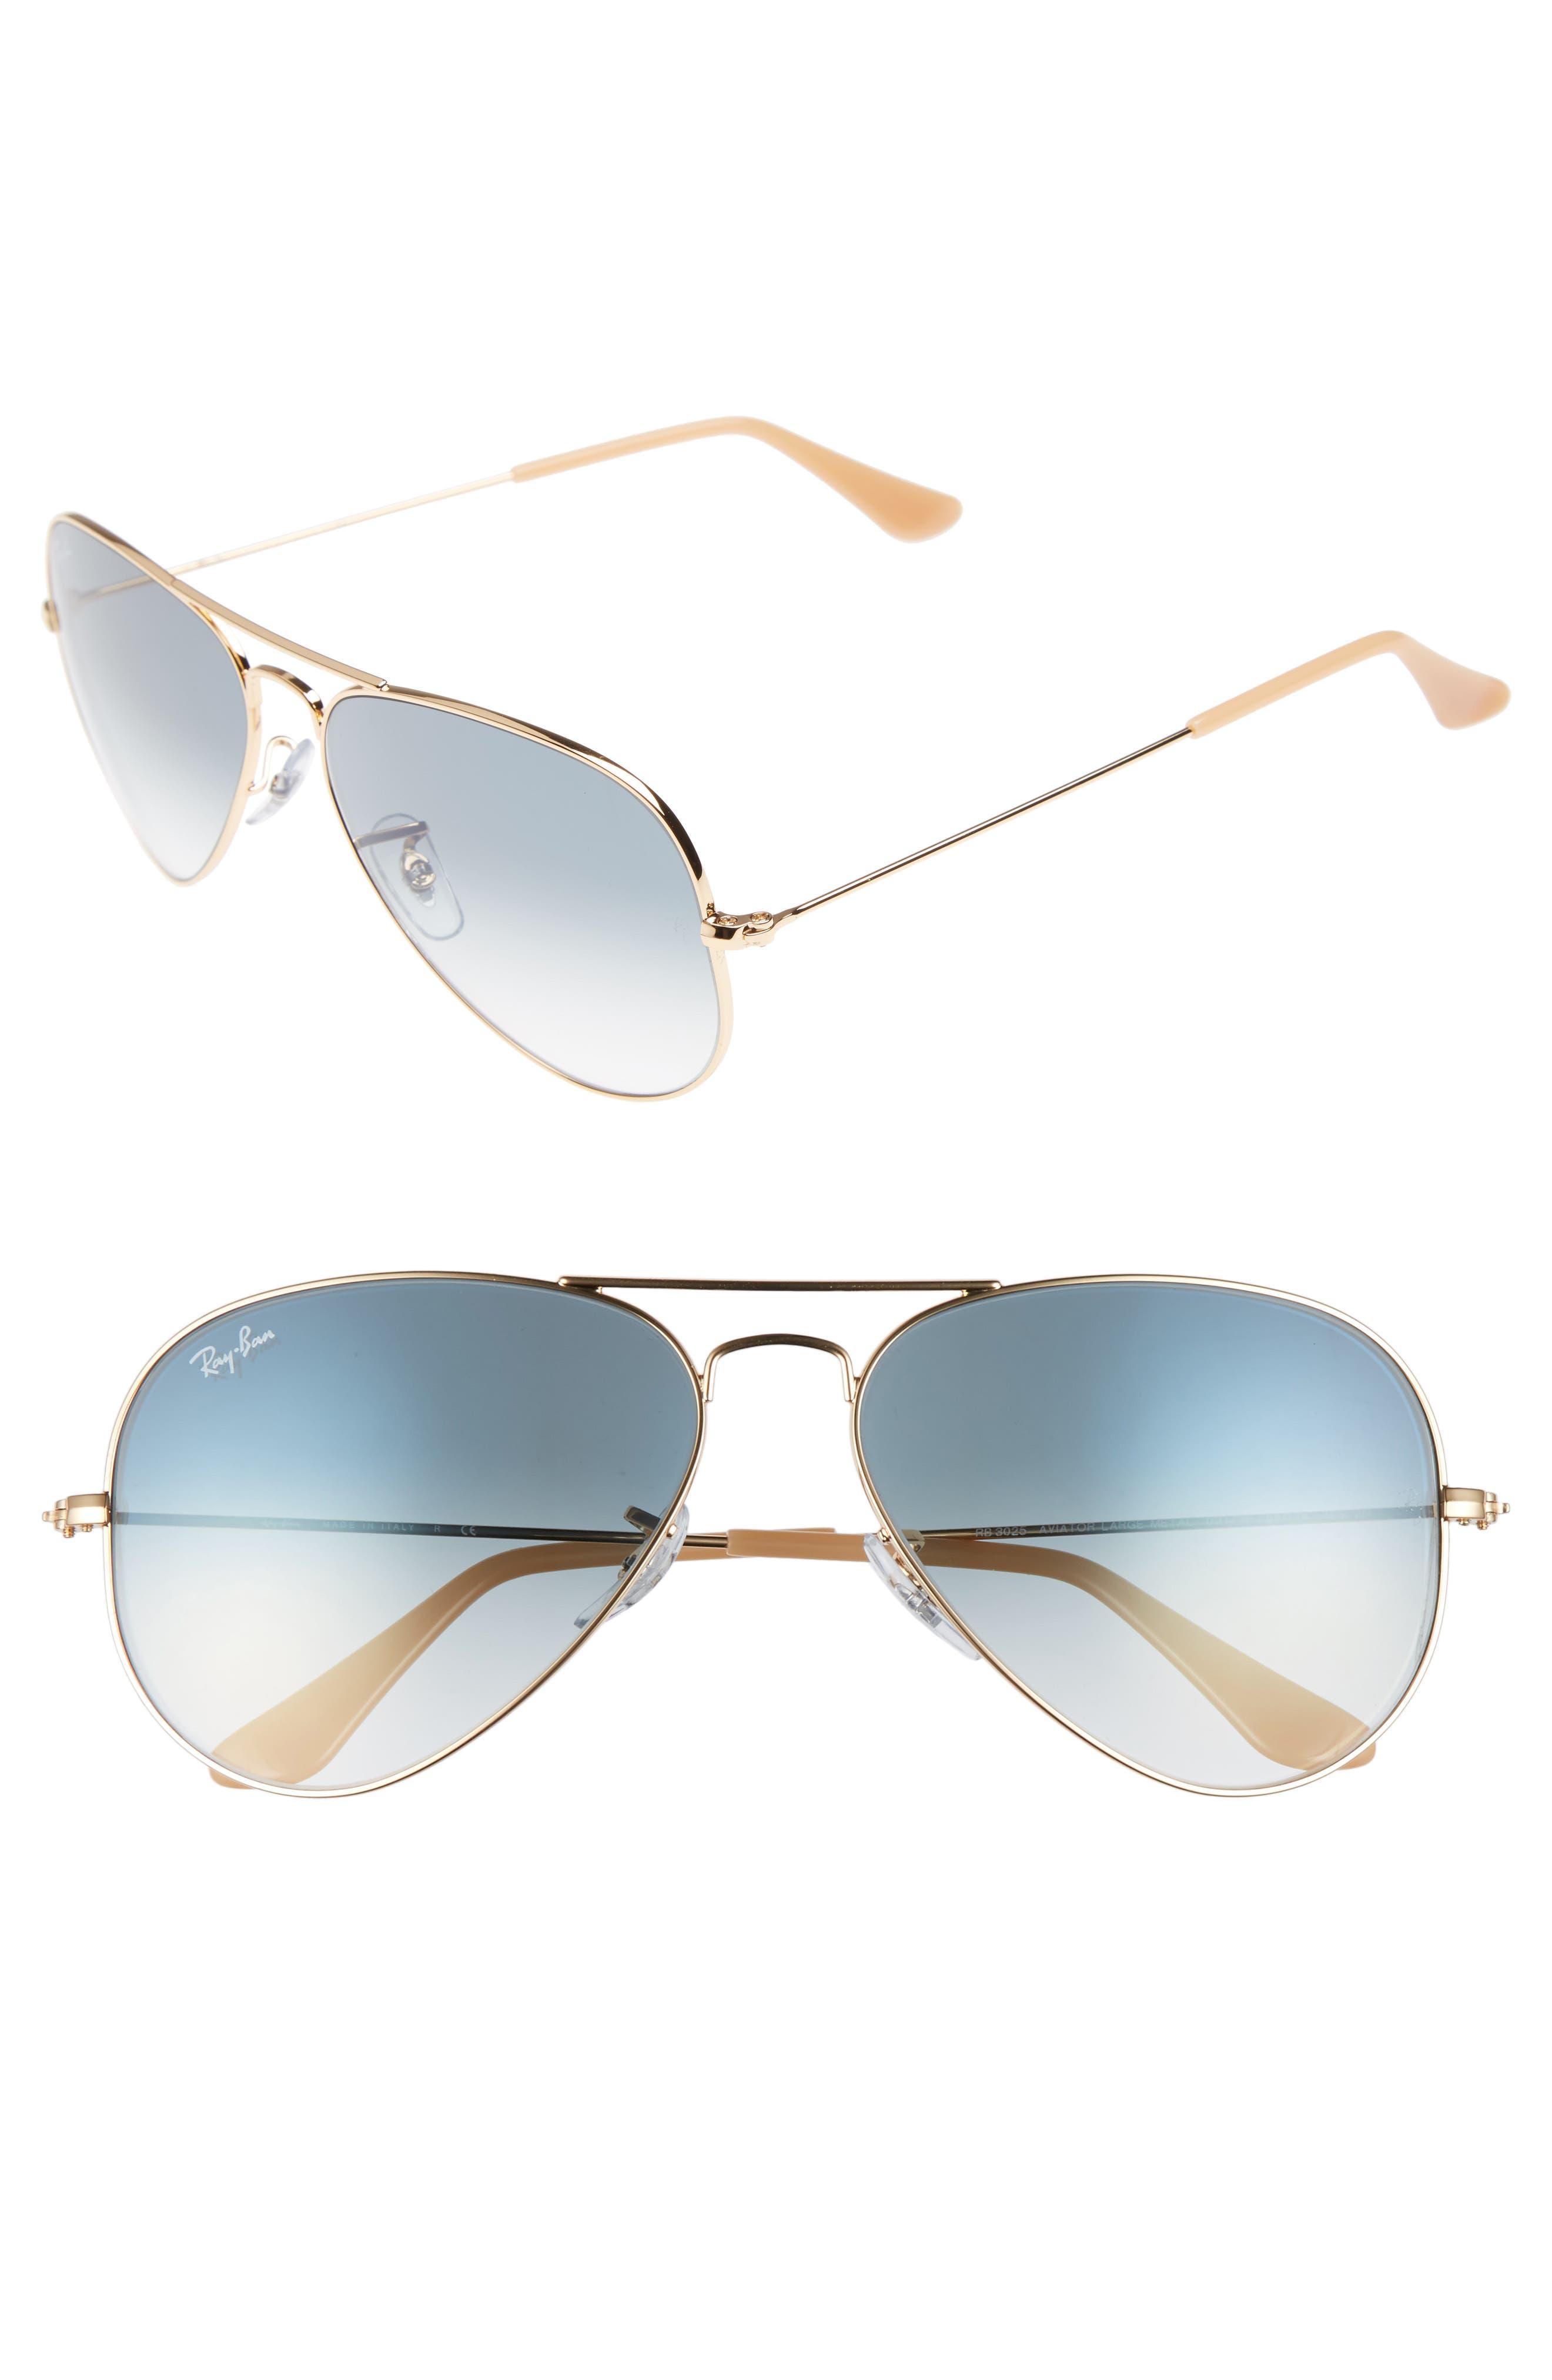 RAY-BAN, Original Aviator 58mm Sunglasses, Main thumbnail 1, color, MATTE GOLD/ BLUE MIRROR